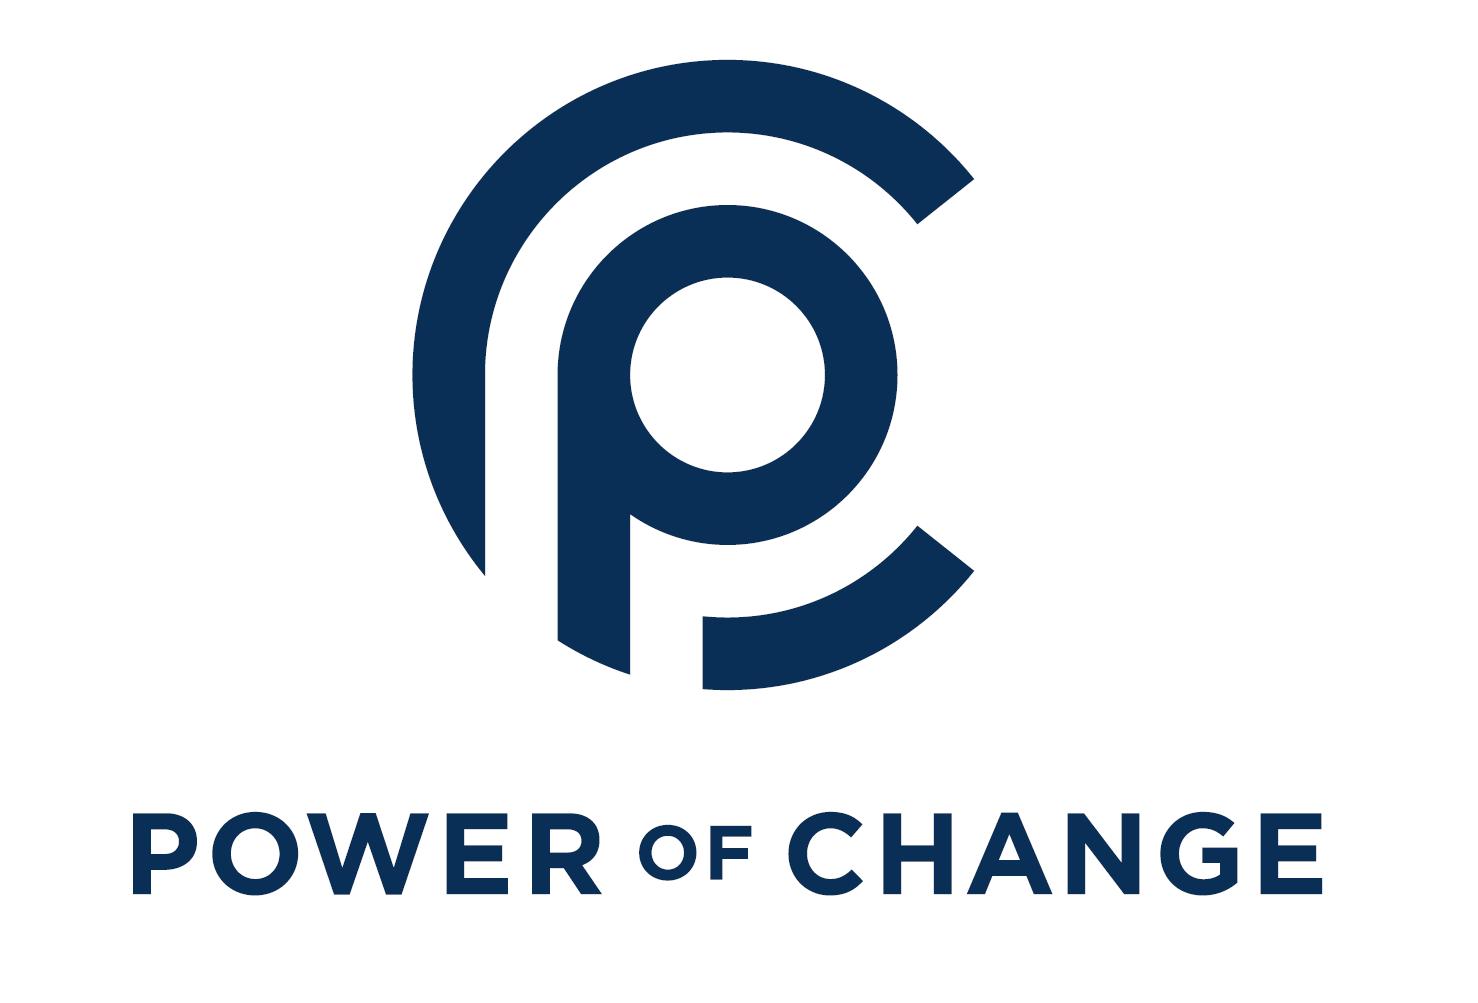 POC Blog — Power of Change